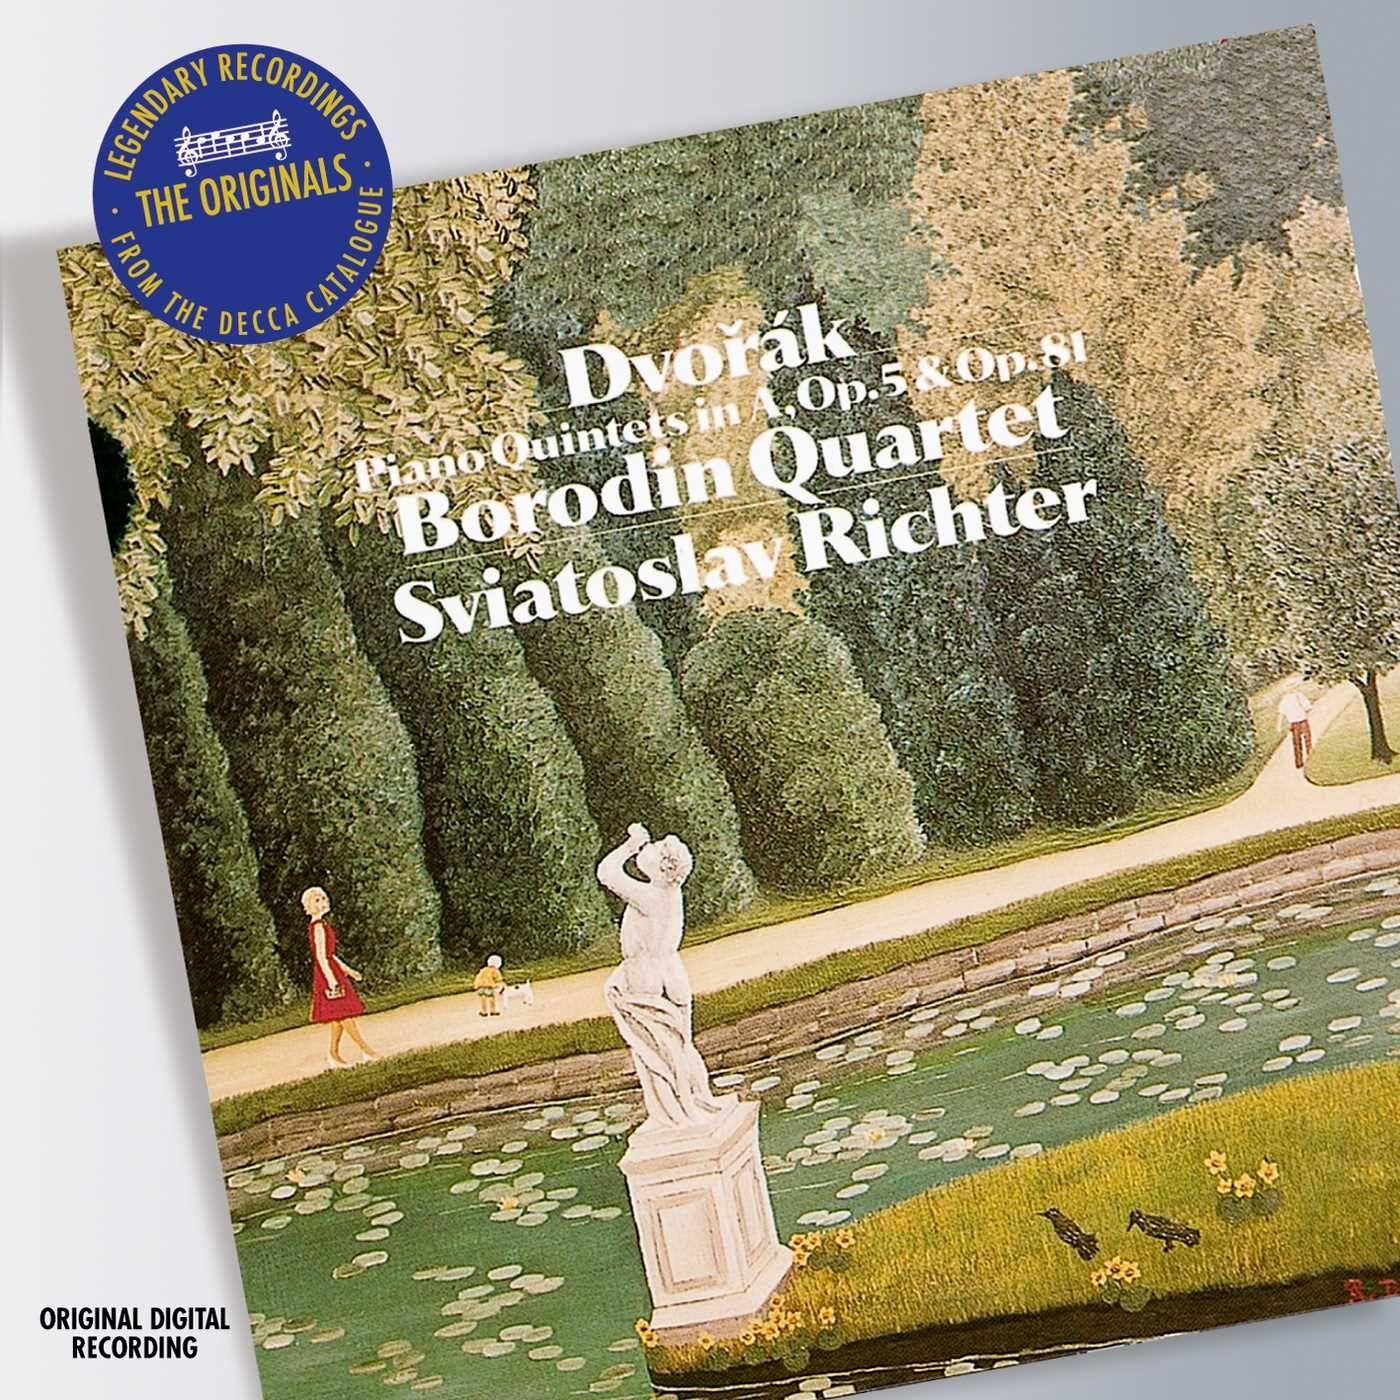 Аудио диск Richter, Sviatoslav Dvorak: Piano Quintets Nos.1 #and# 2